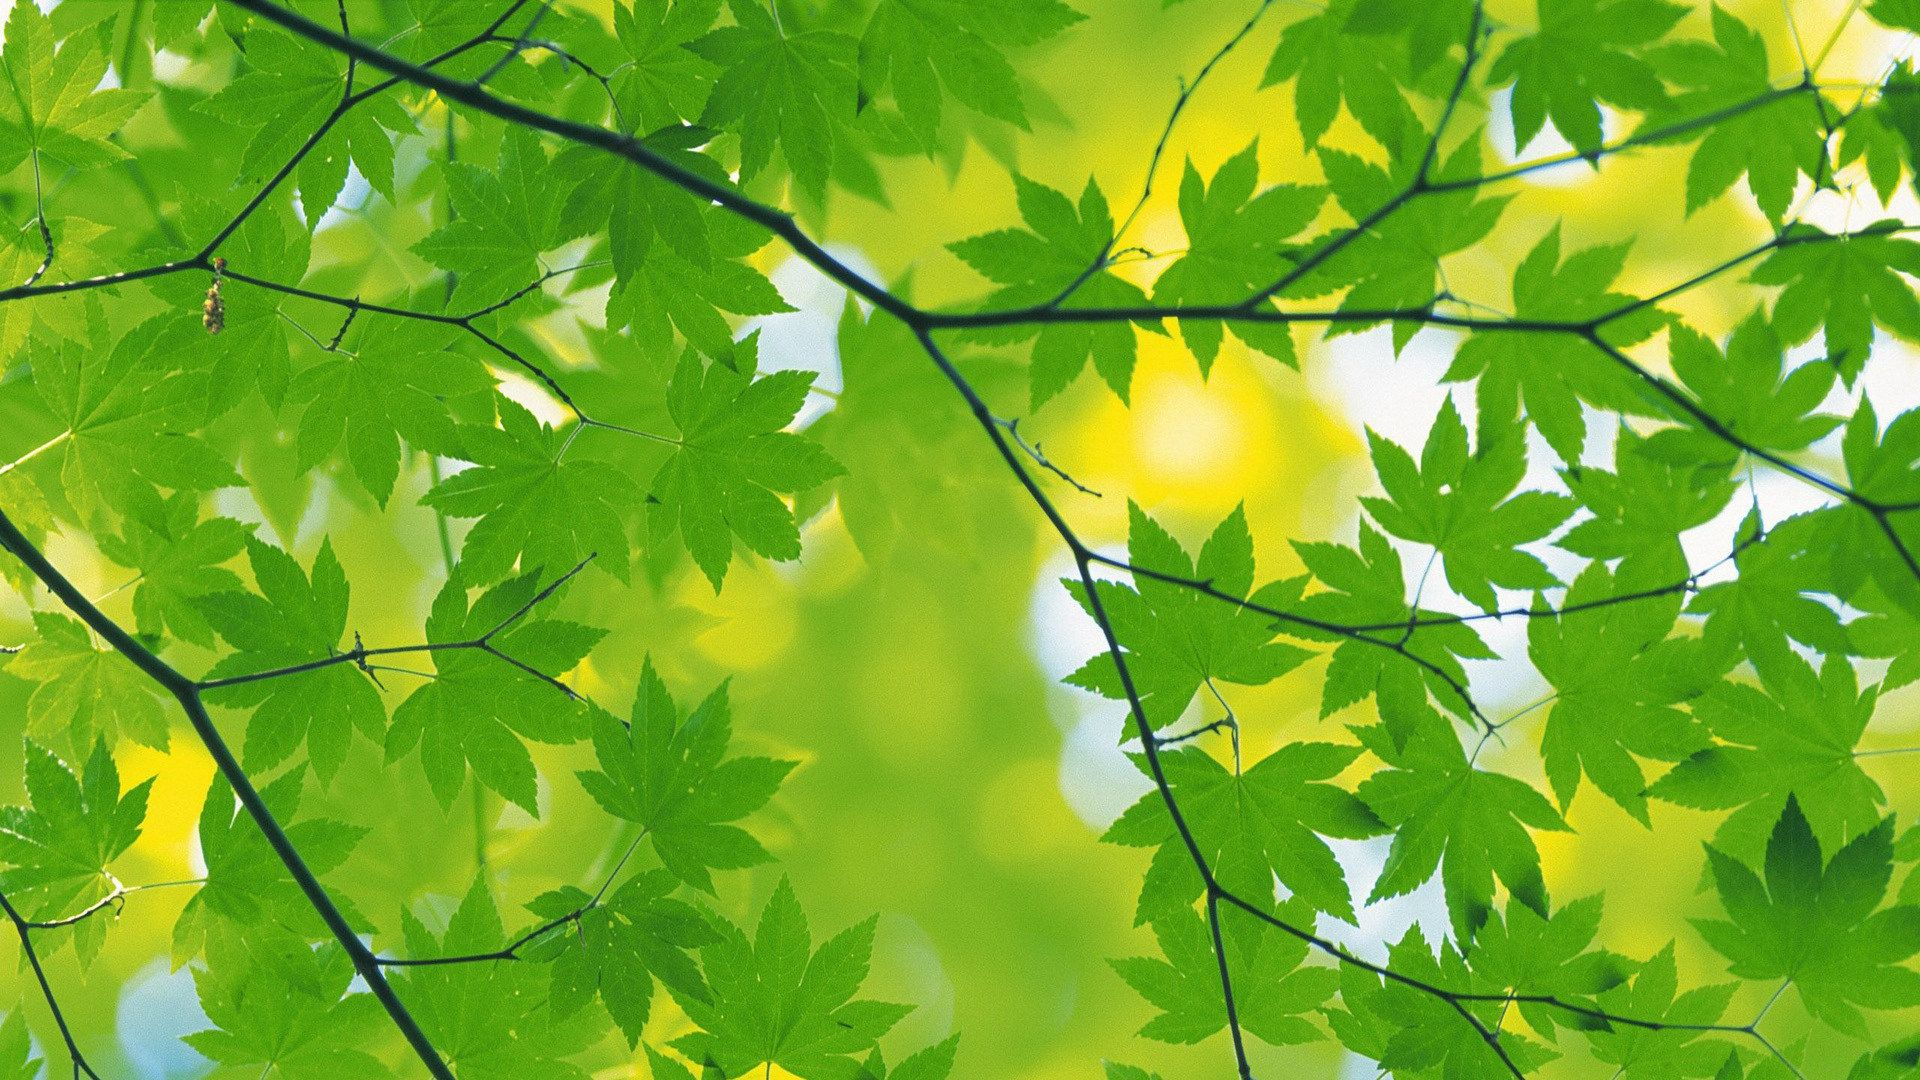 Foliage Picture